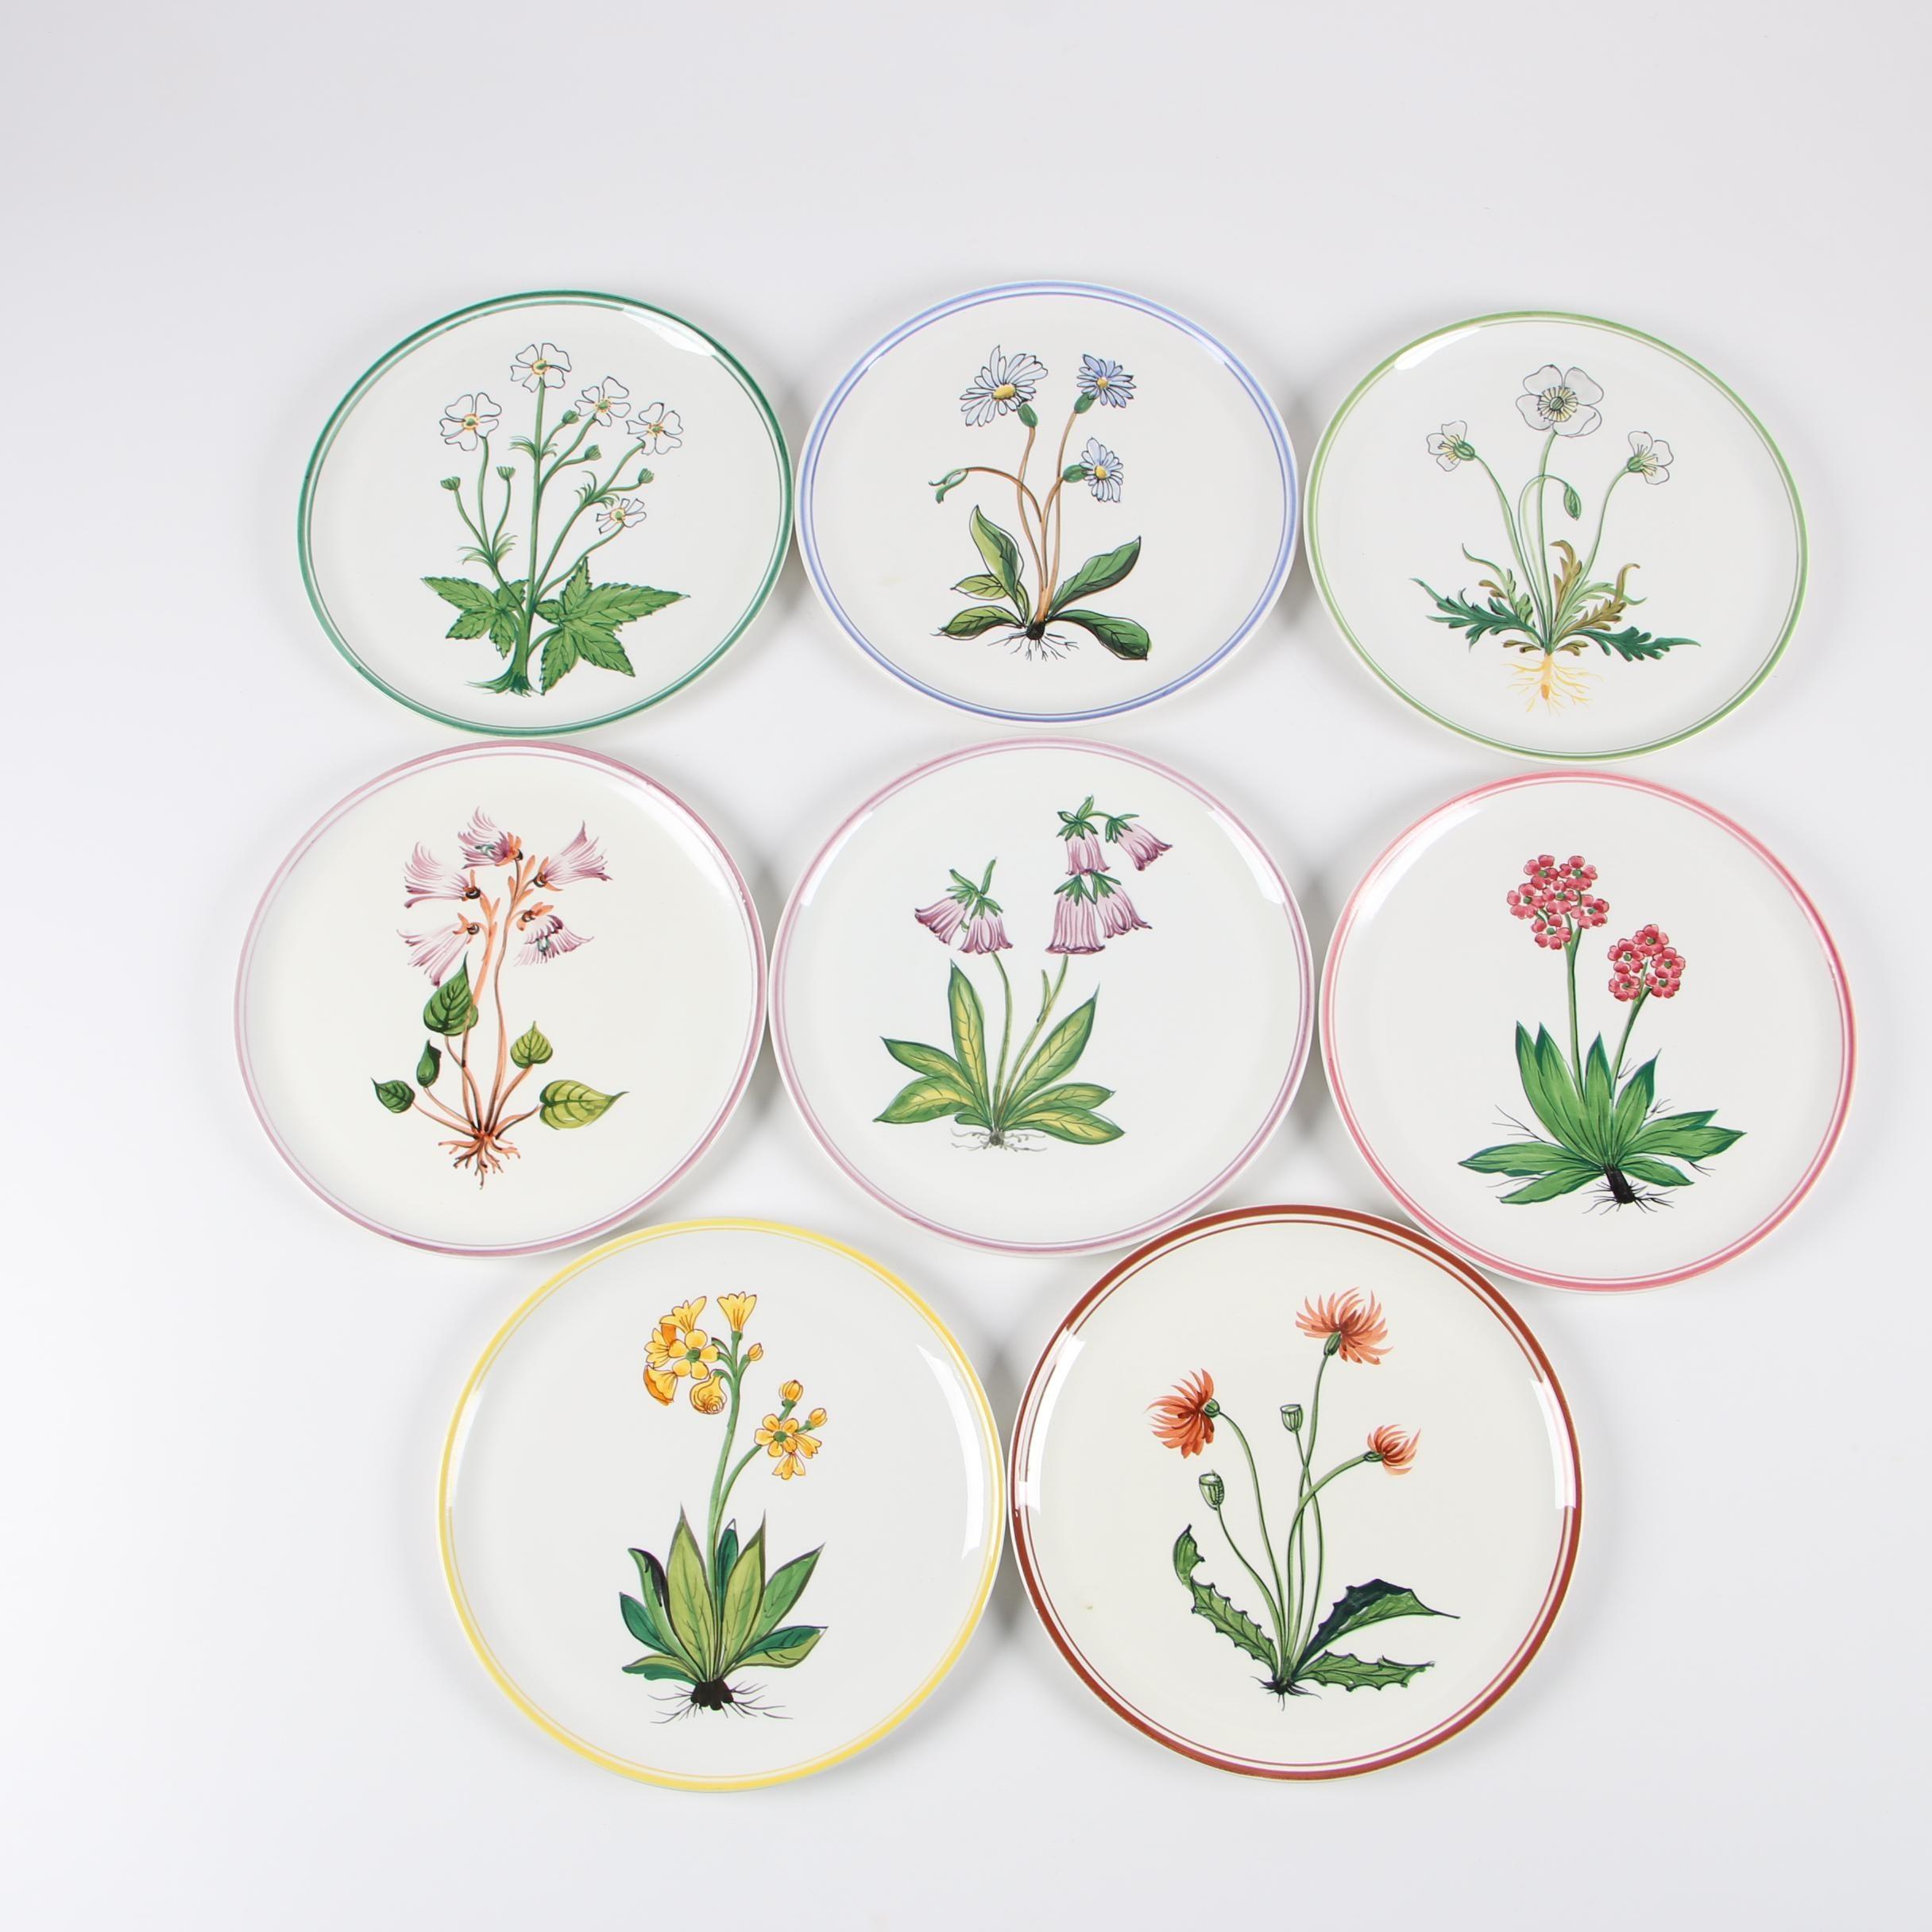 Italian Hand-Painted Ceramic Salad Plates